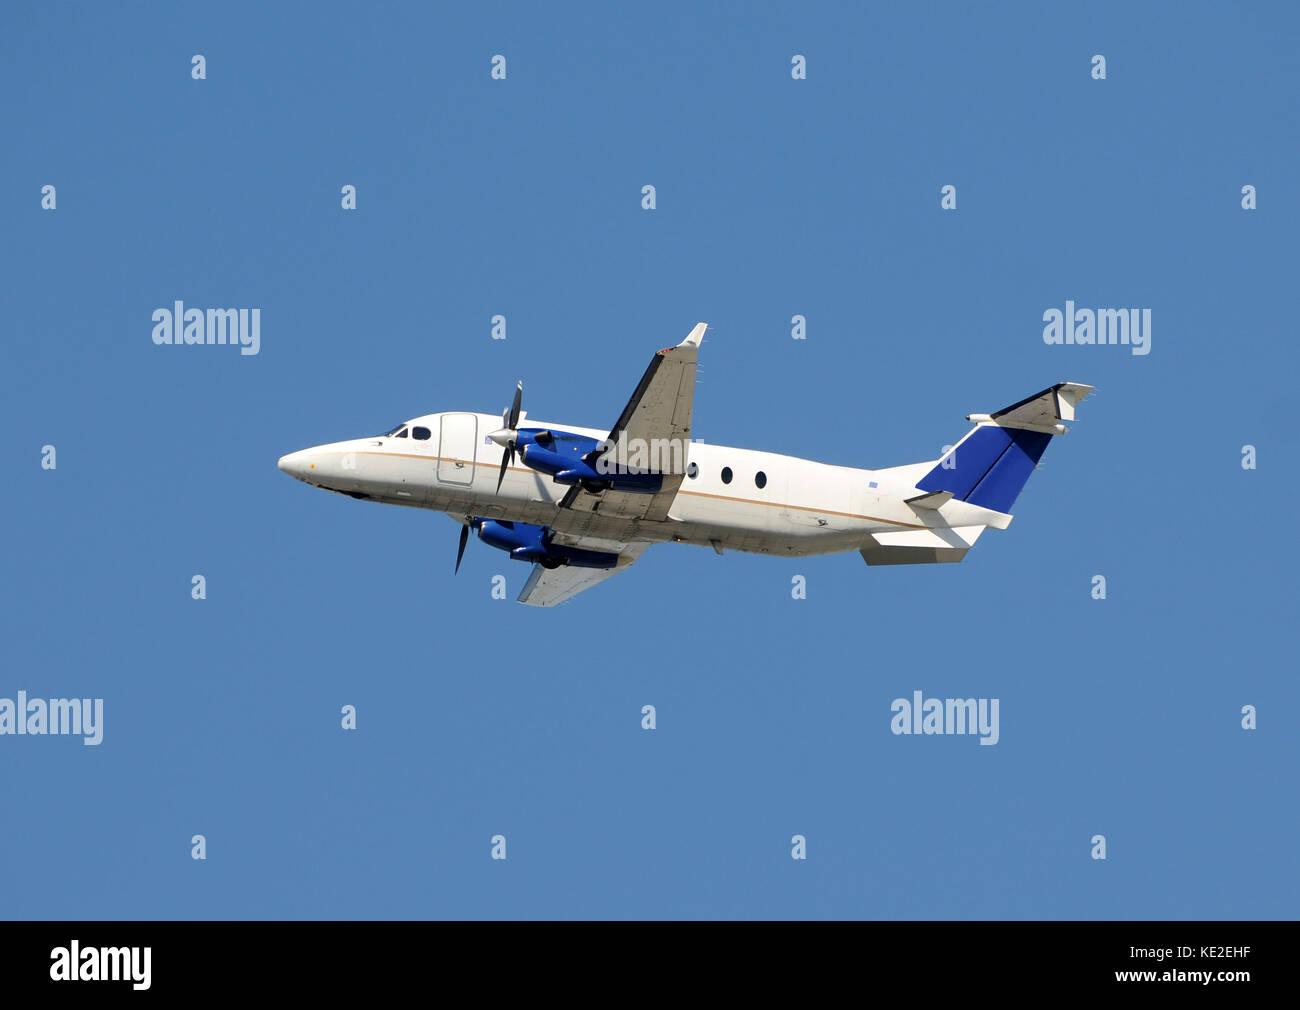 Modern turboprop airplane for regional passenger service - Stock Image